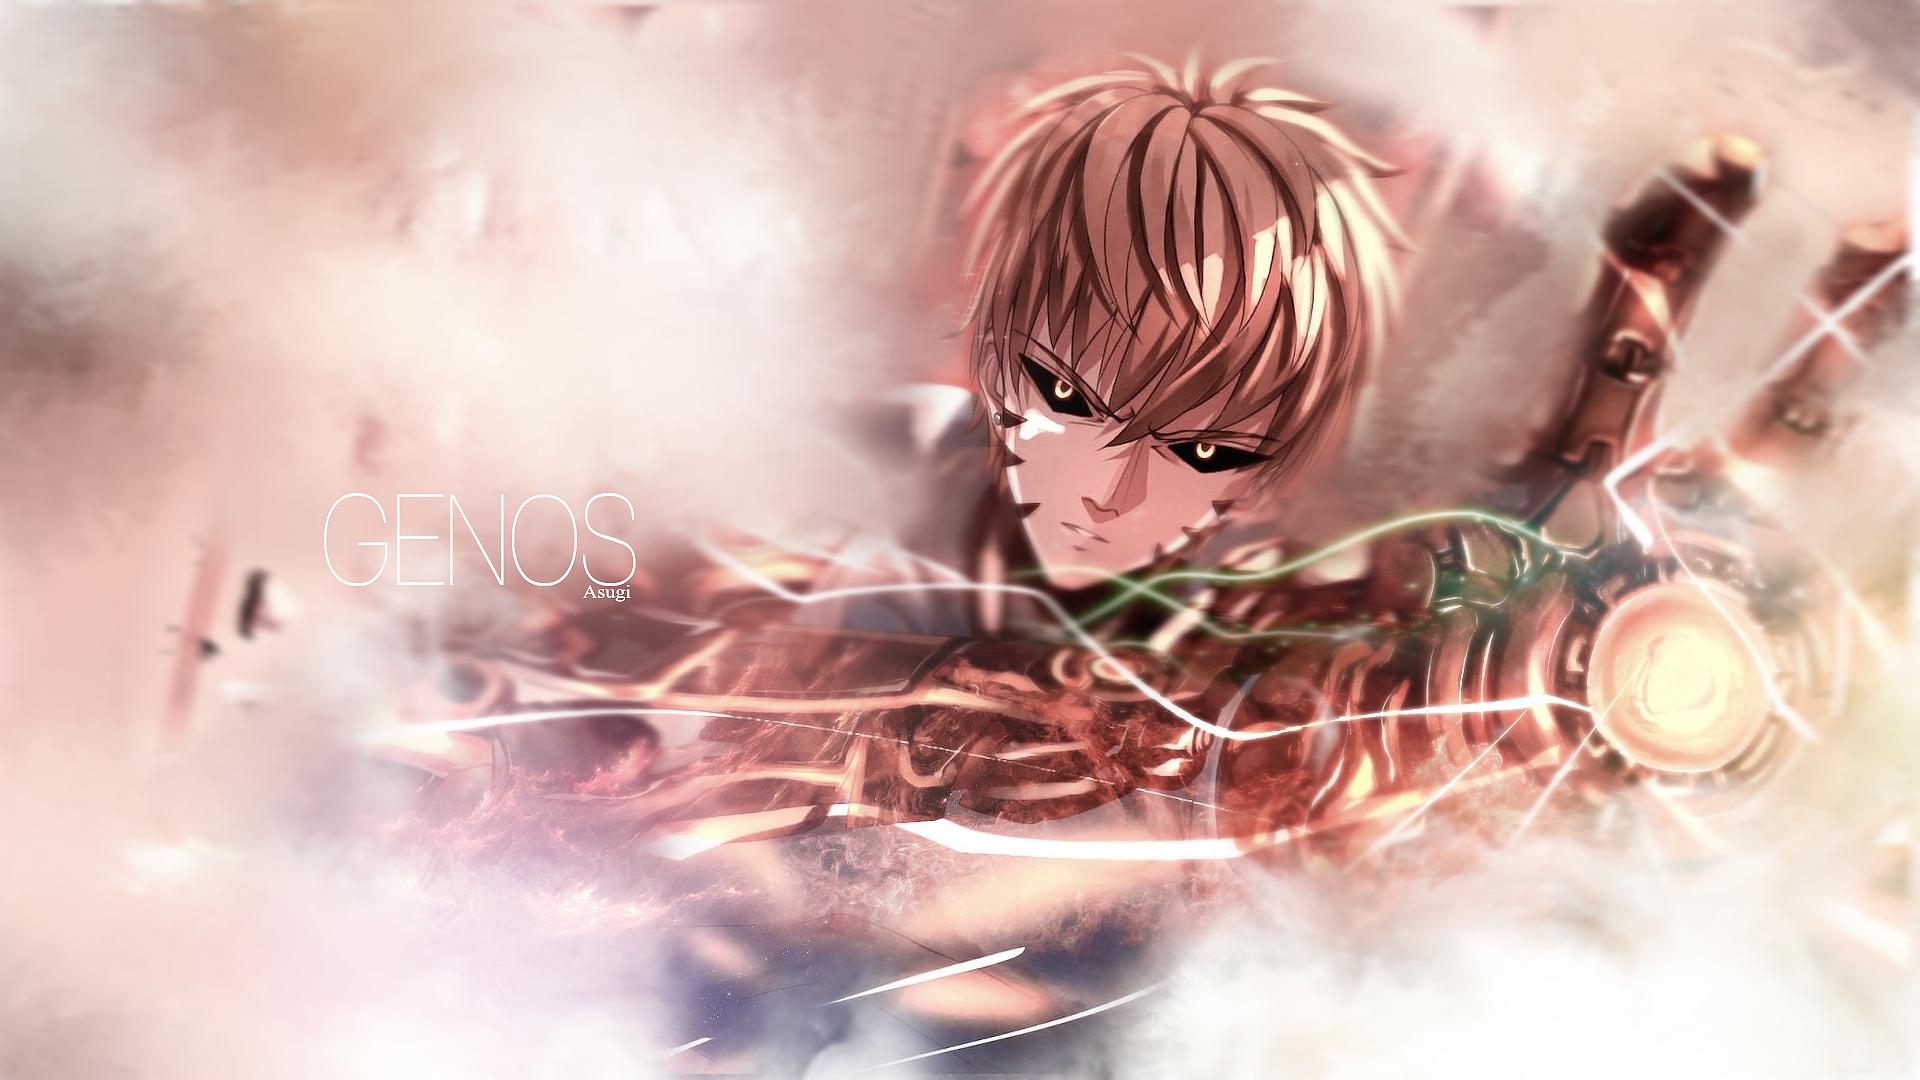 Anime 1920x1080 One-Punch Man anime cyborg Genos yellow eyes